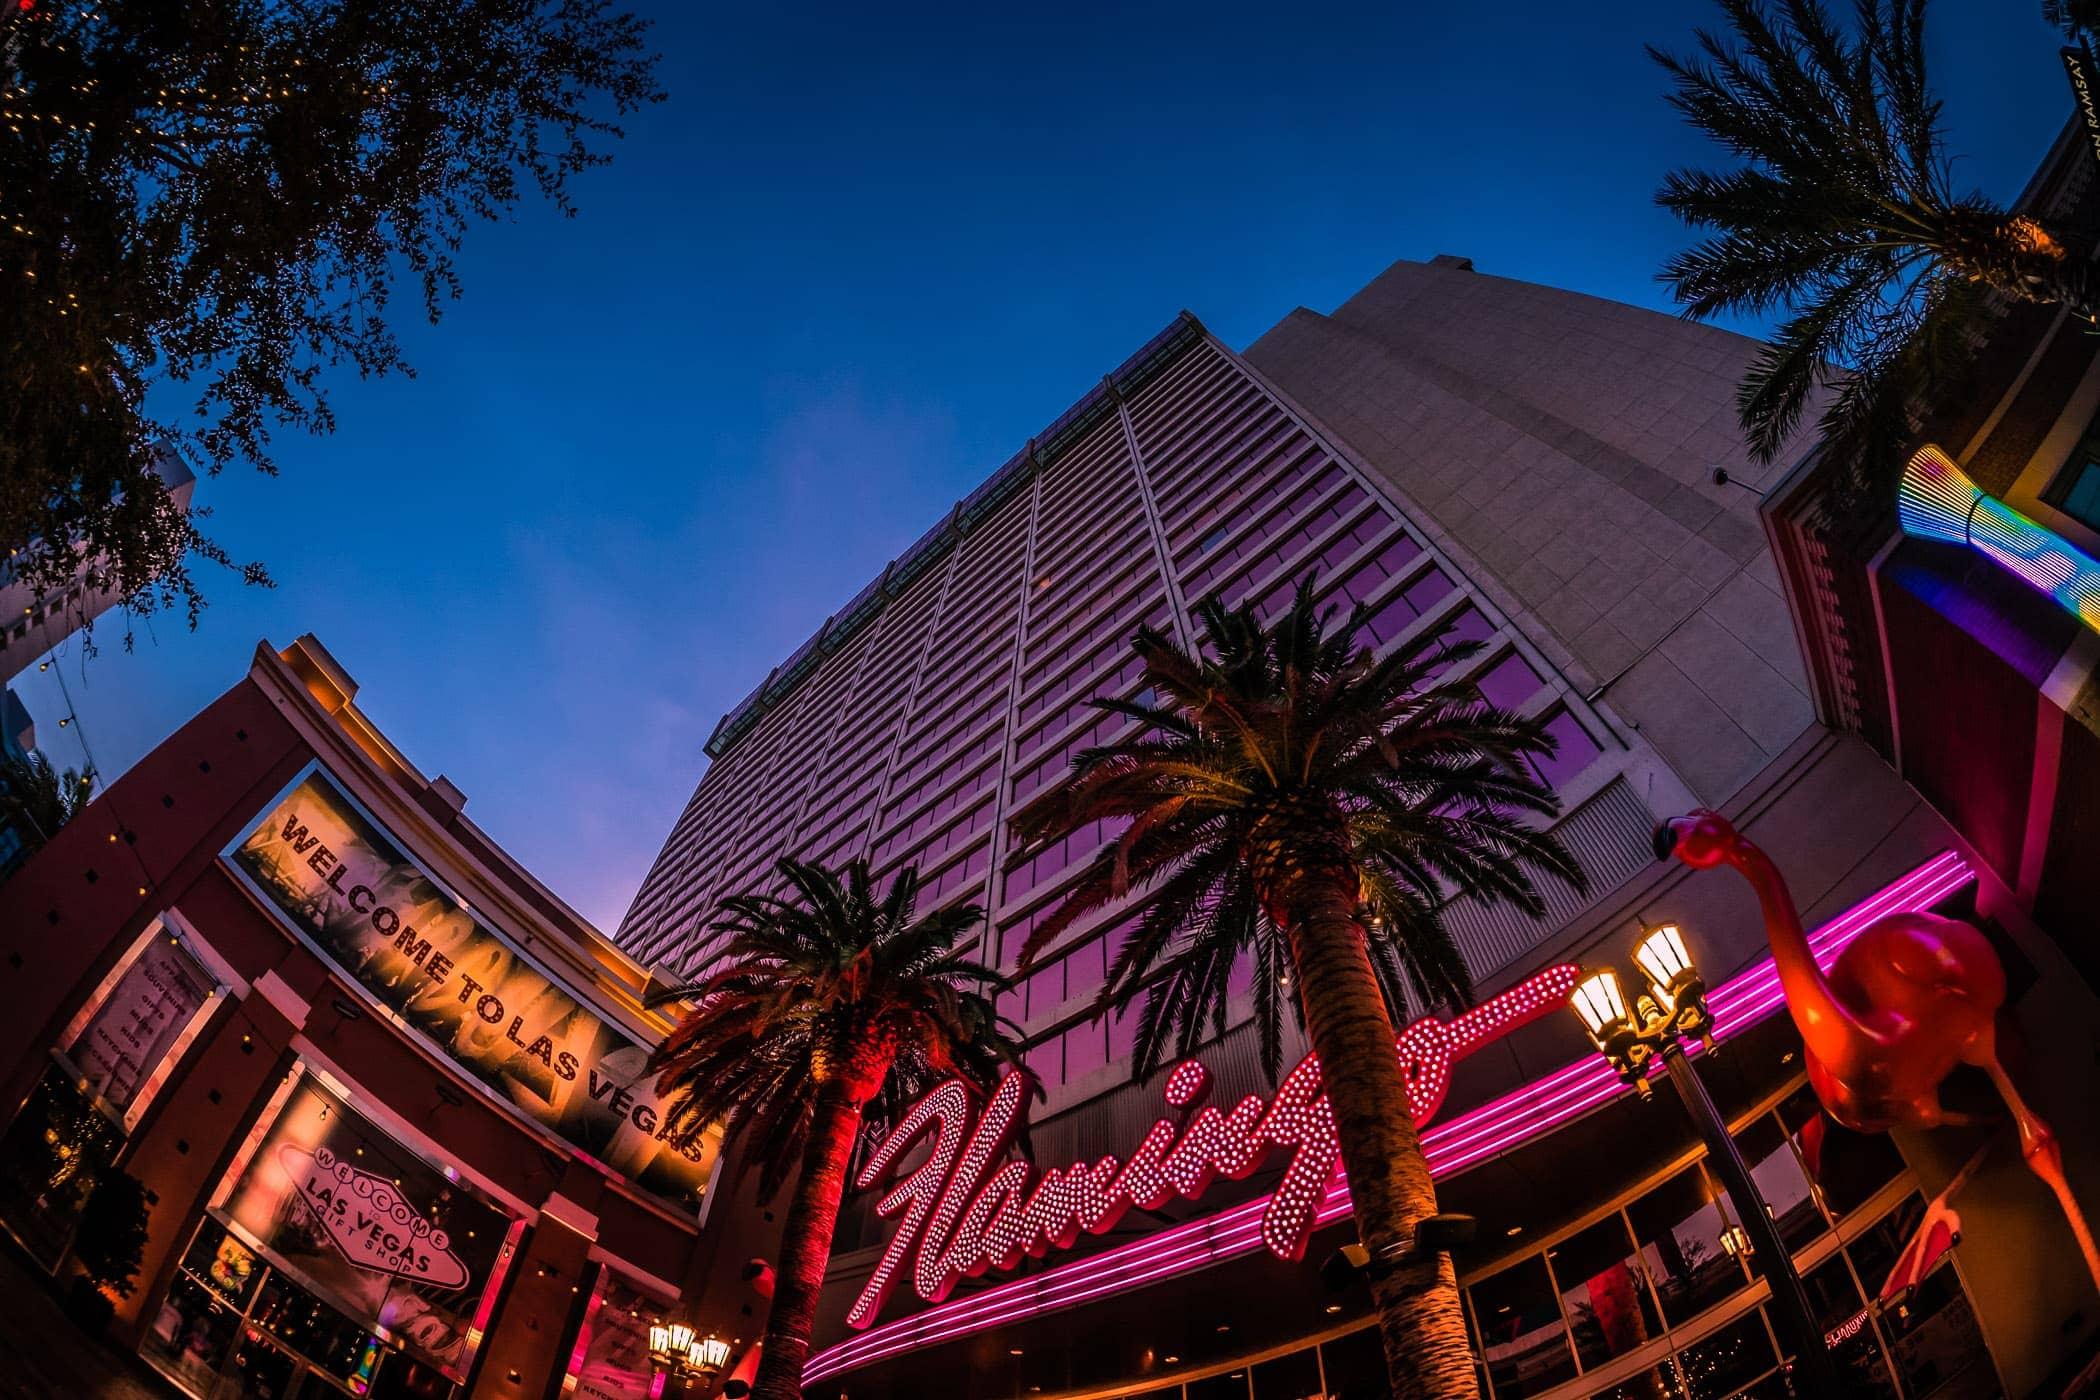 Early-morning at The Flamingo, Las Vegas.